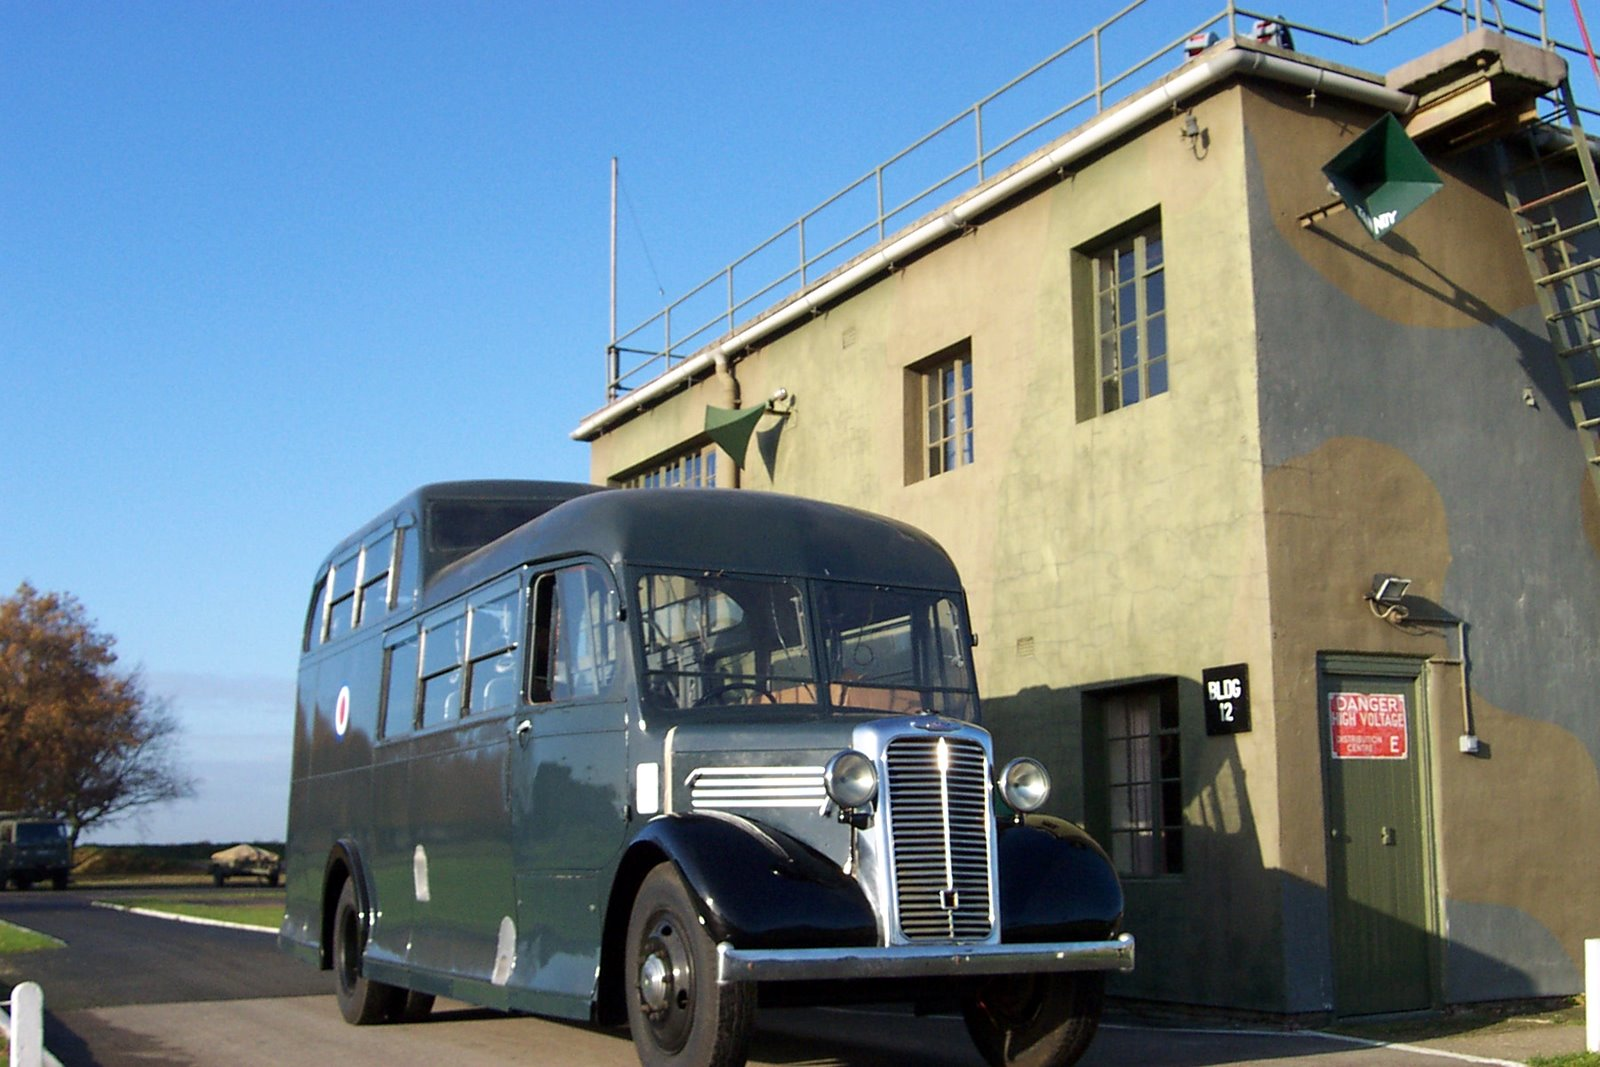 Vehicle - Vehicle - Bus - Commer - Commando